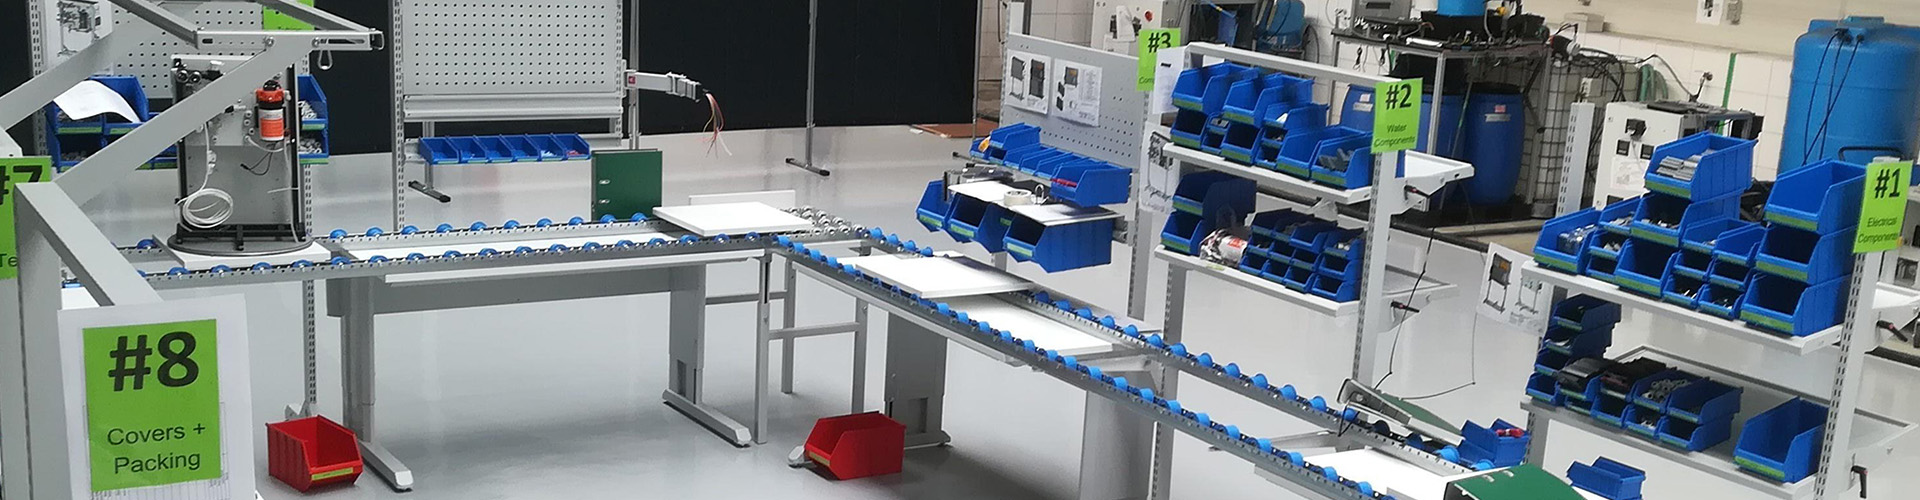 Sovella Nederland Treston Multiline handmatige assemblagelijn met werktafels en inpaktafel